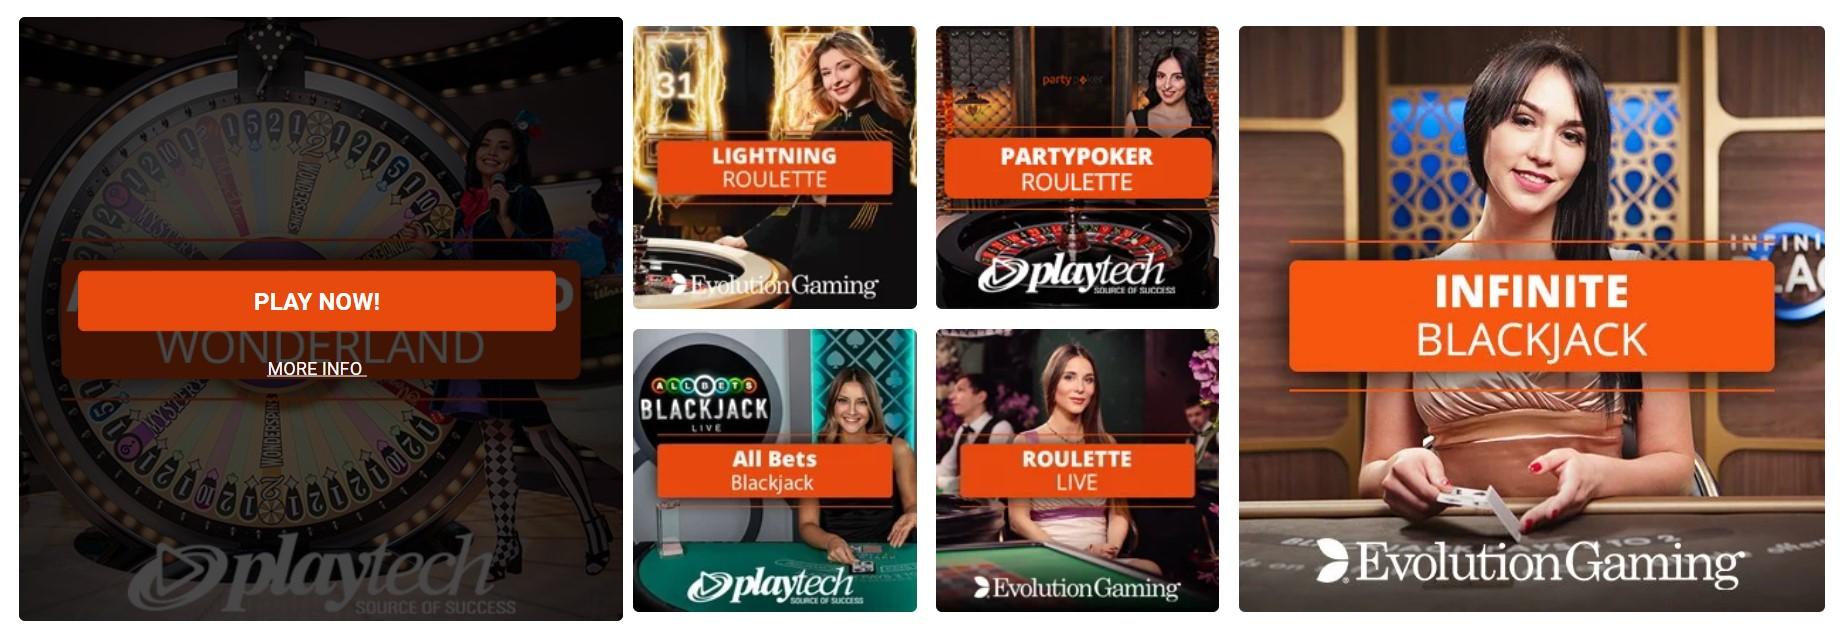 Partypoker live casino